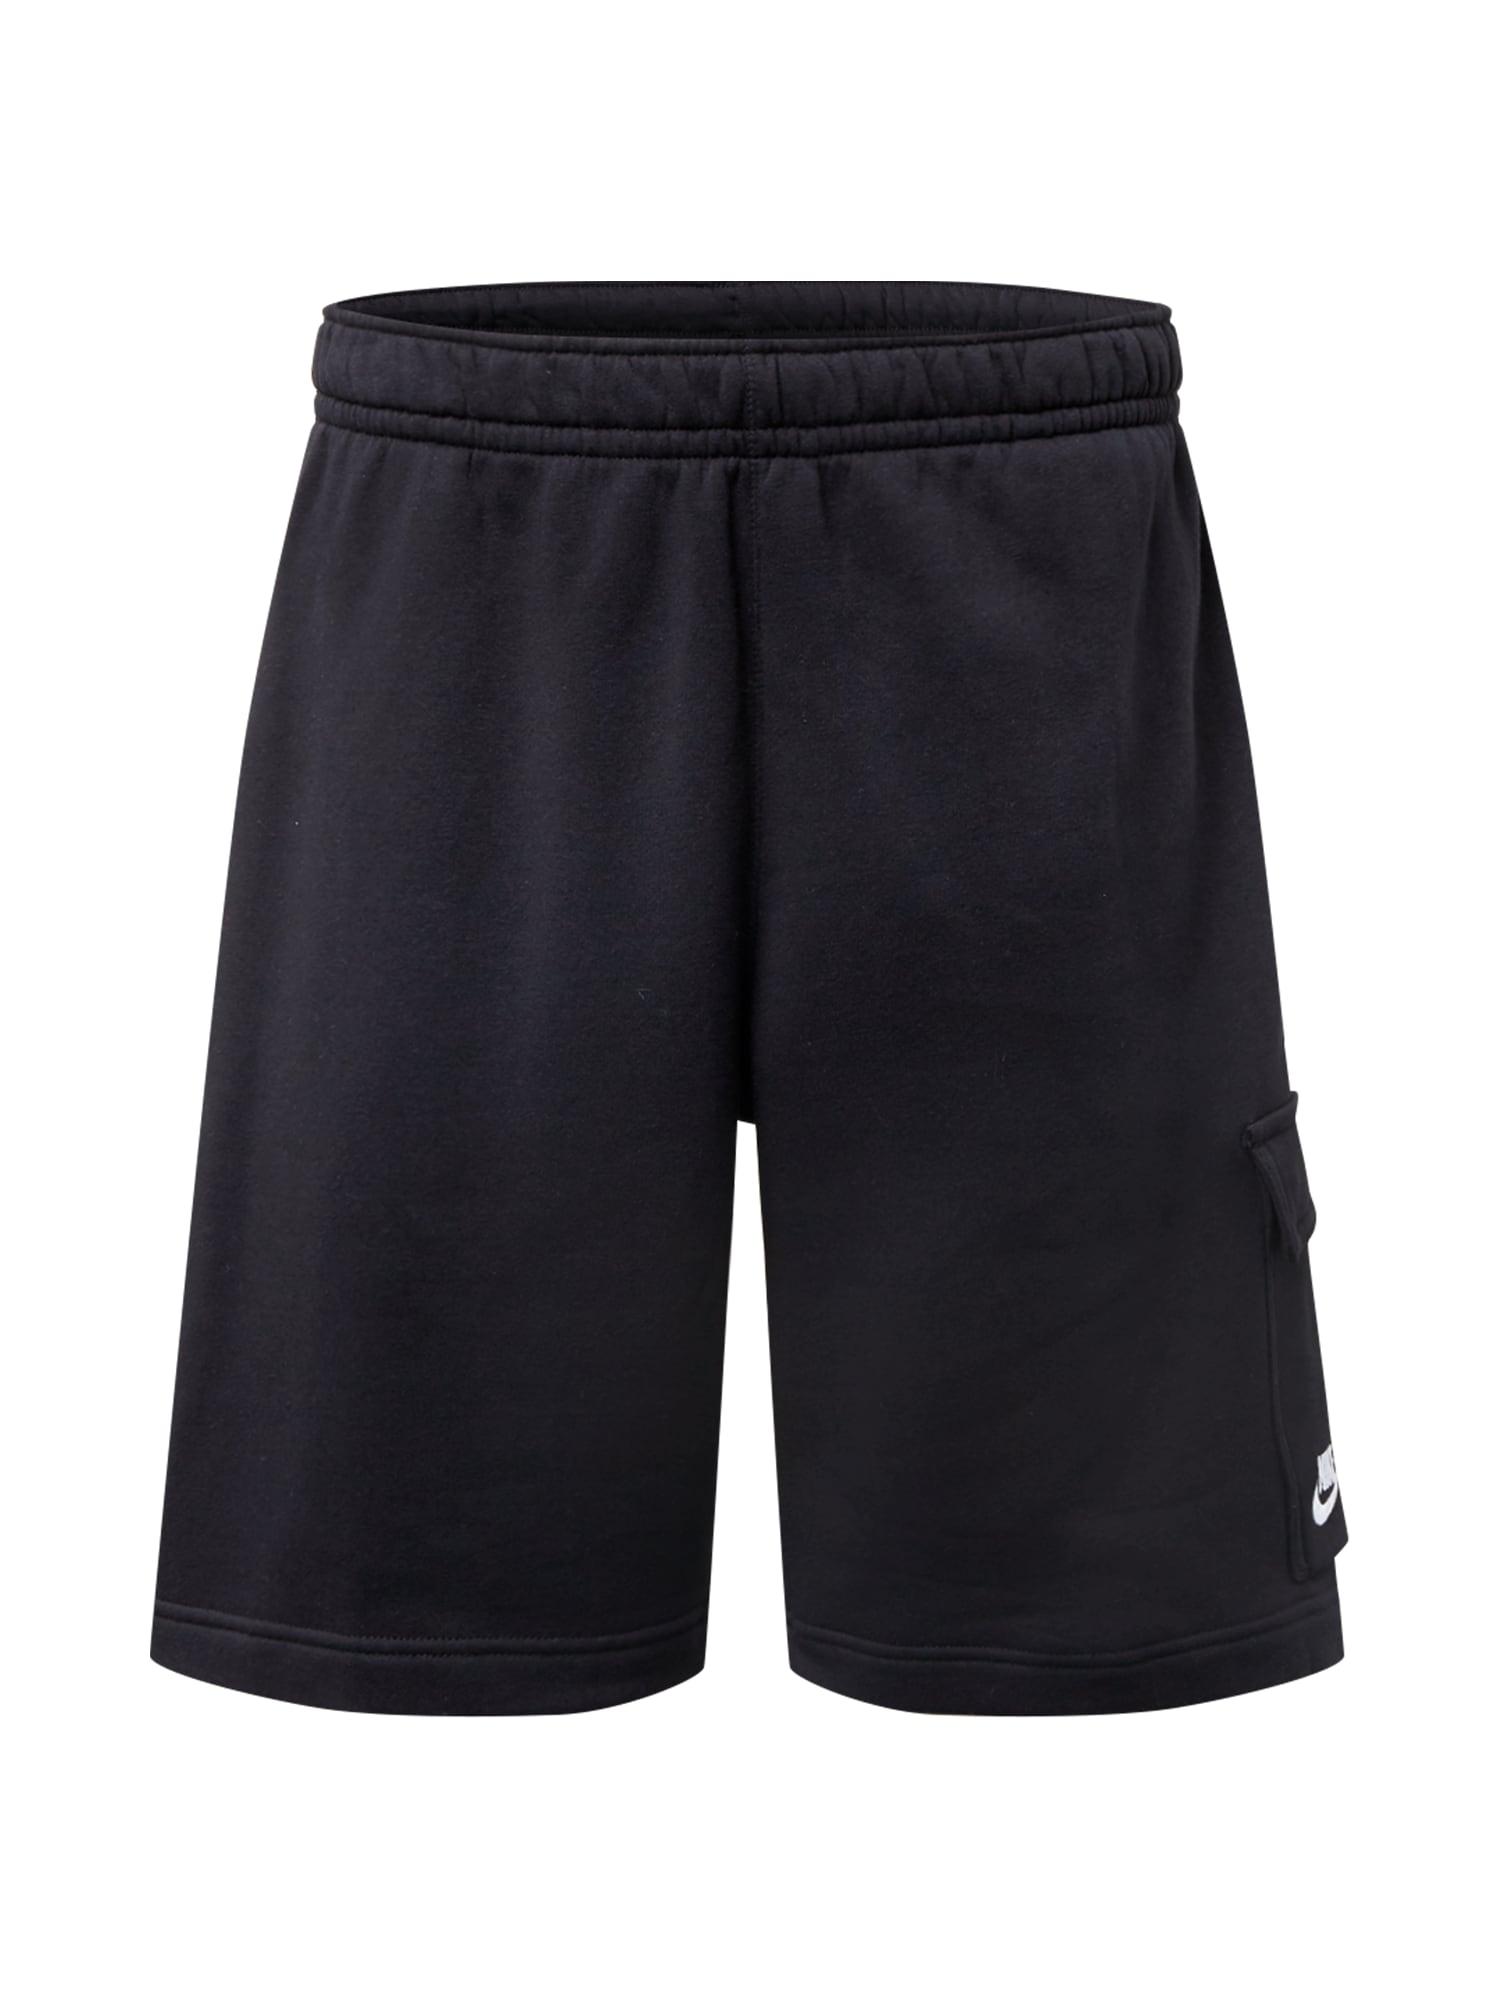 Nike Sportswear Laisvo stiliaus kelnės 'Club' juoda / balta